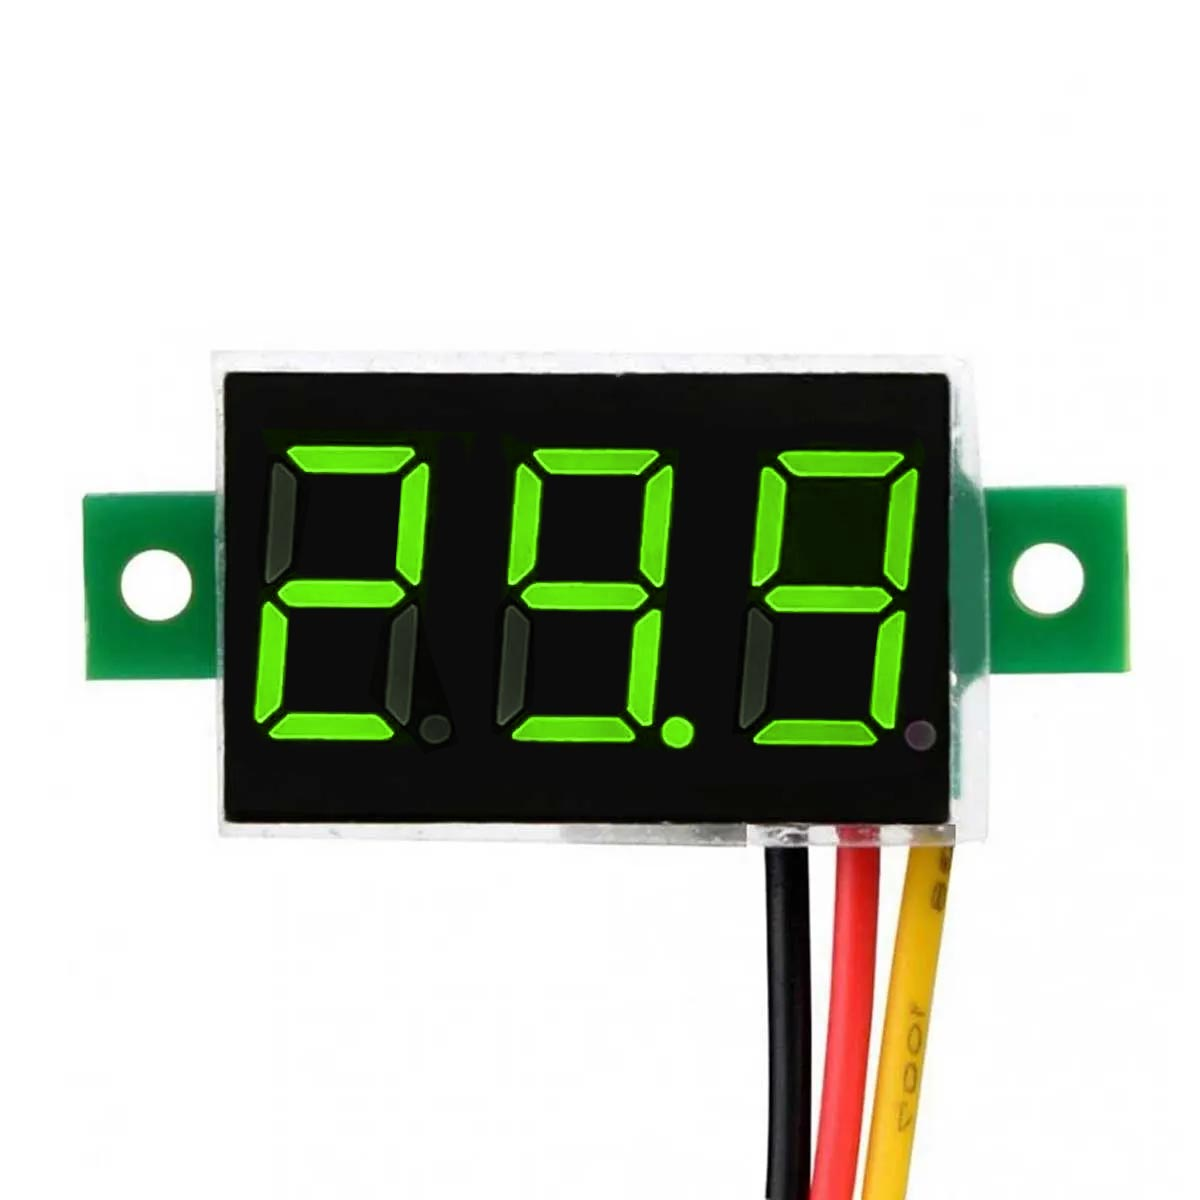 2x Mini Voltímetro Digital 0v a 100v | Display Verde